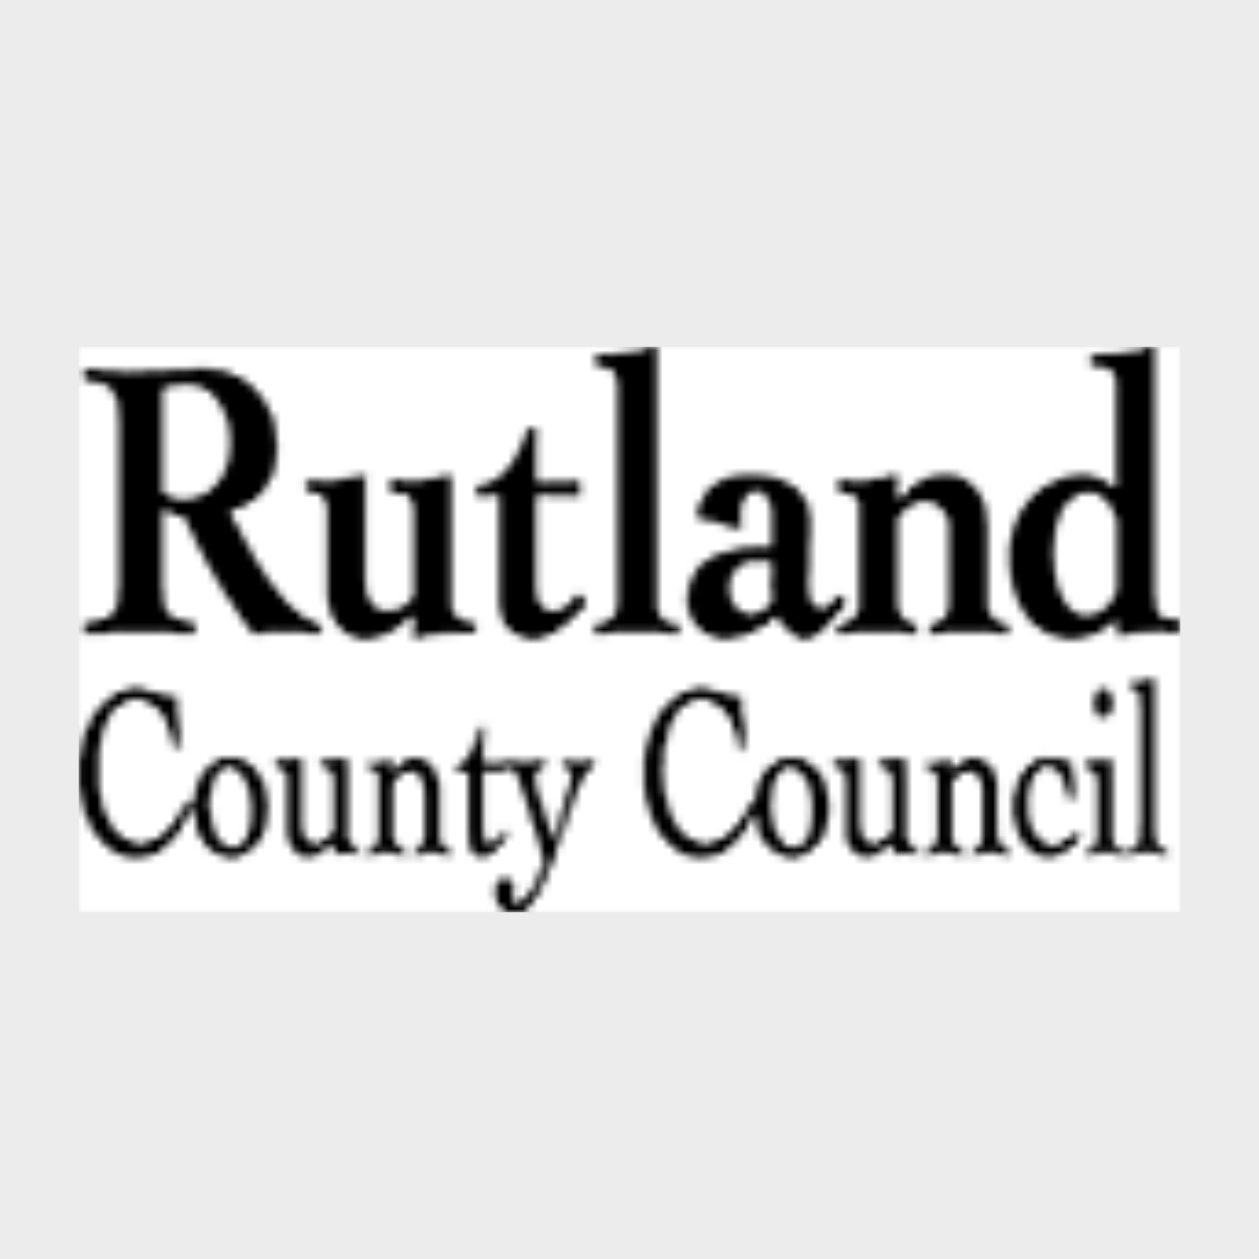 Rutland County Council Web Logo.png